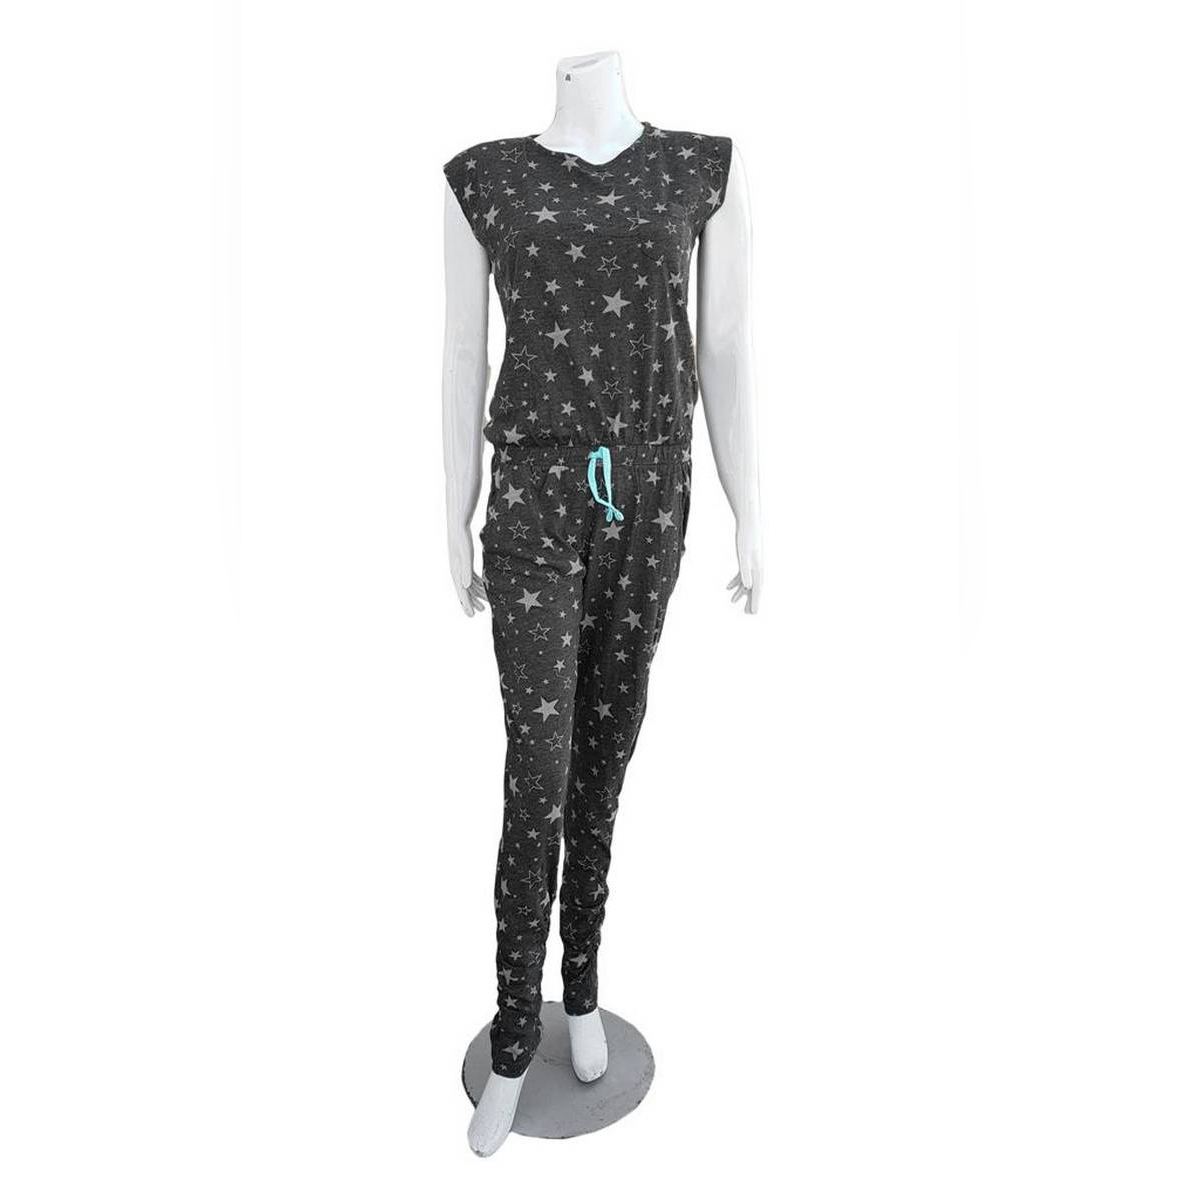 Women Fashion Dark Grey Star Casual Jumpsuit Summer High Quality Jumpsuit